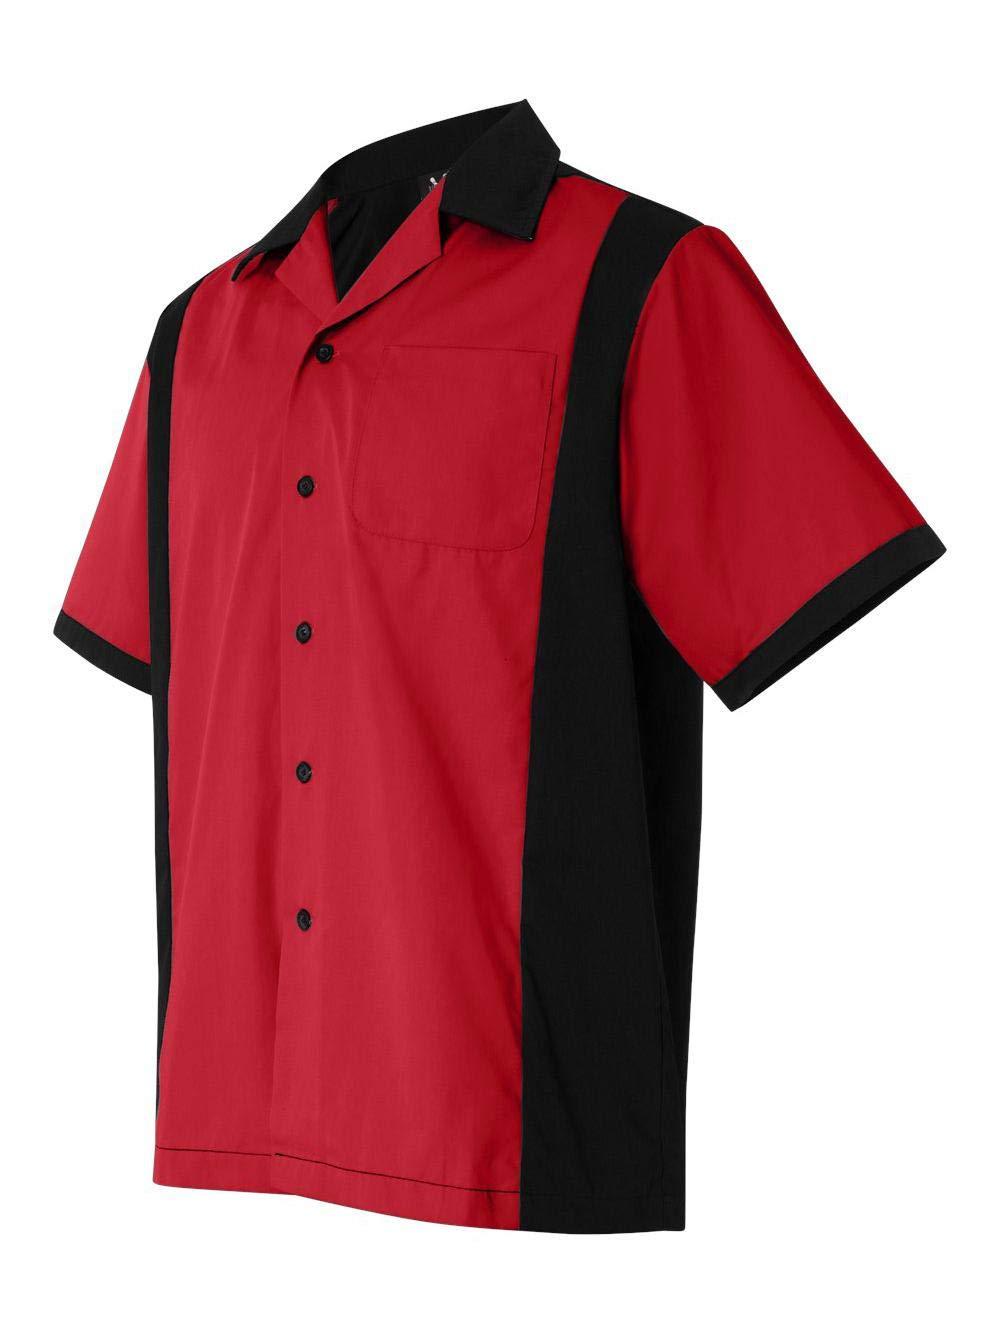 Hilton HP2243 - Cruiser Bowling Shirt Red by Hilton